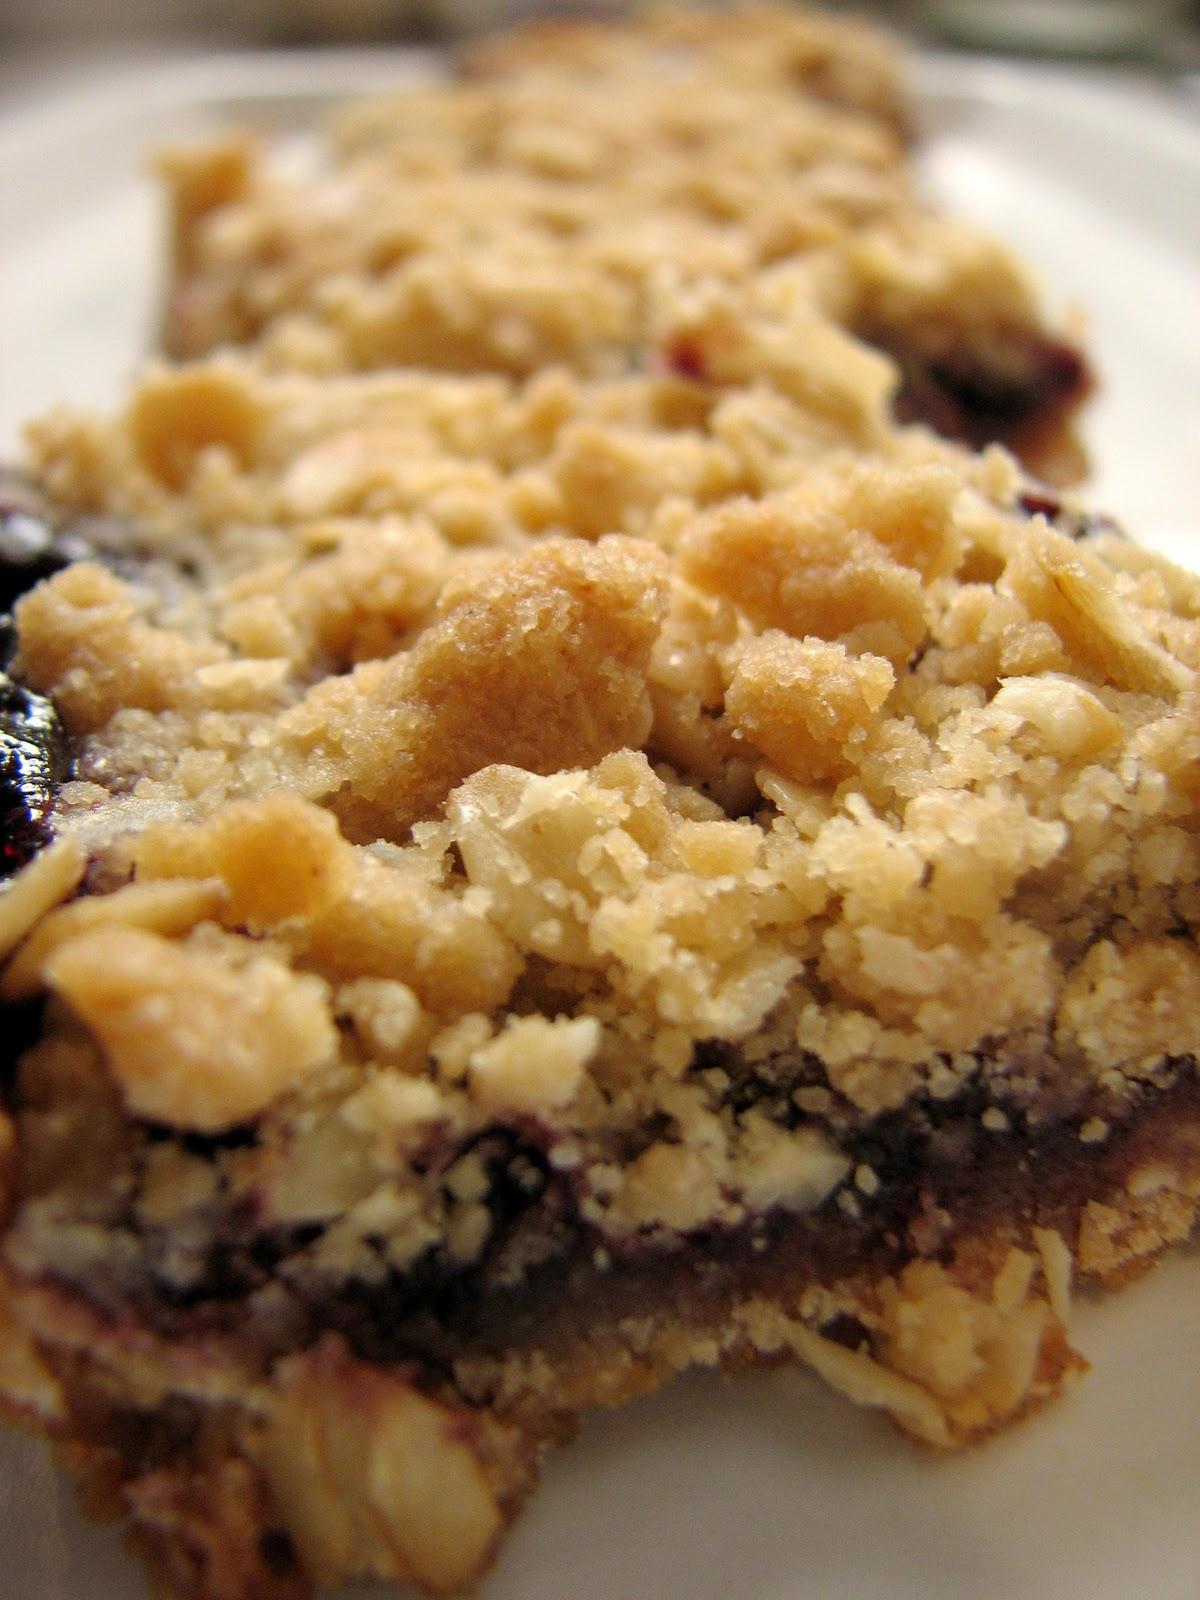 Ashleigh's Kitchen: Black Raspberry Oat Bars